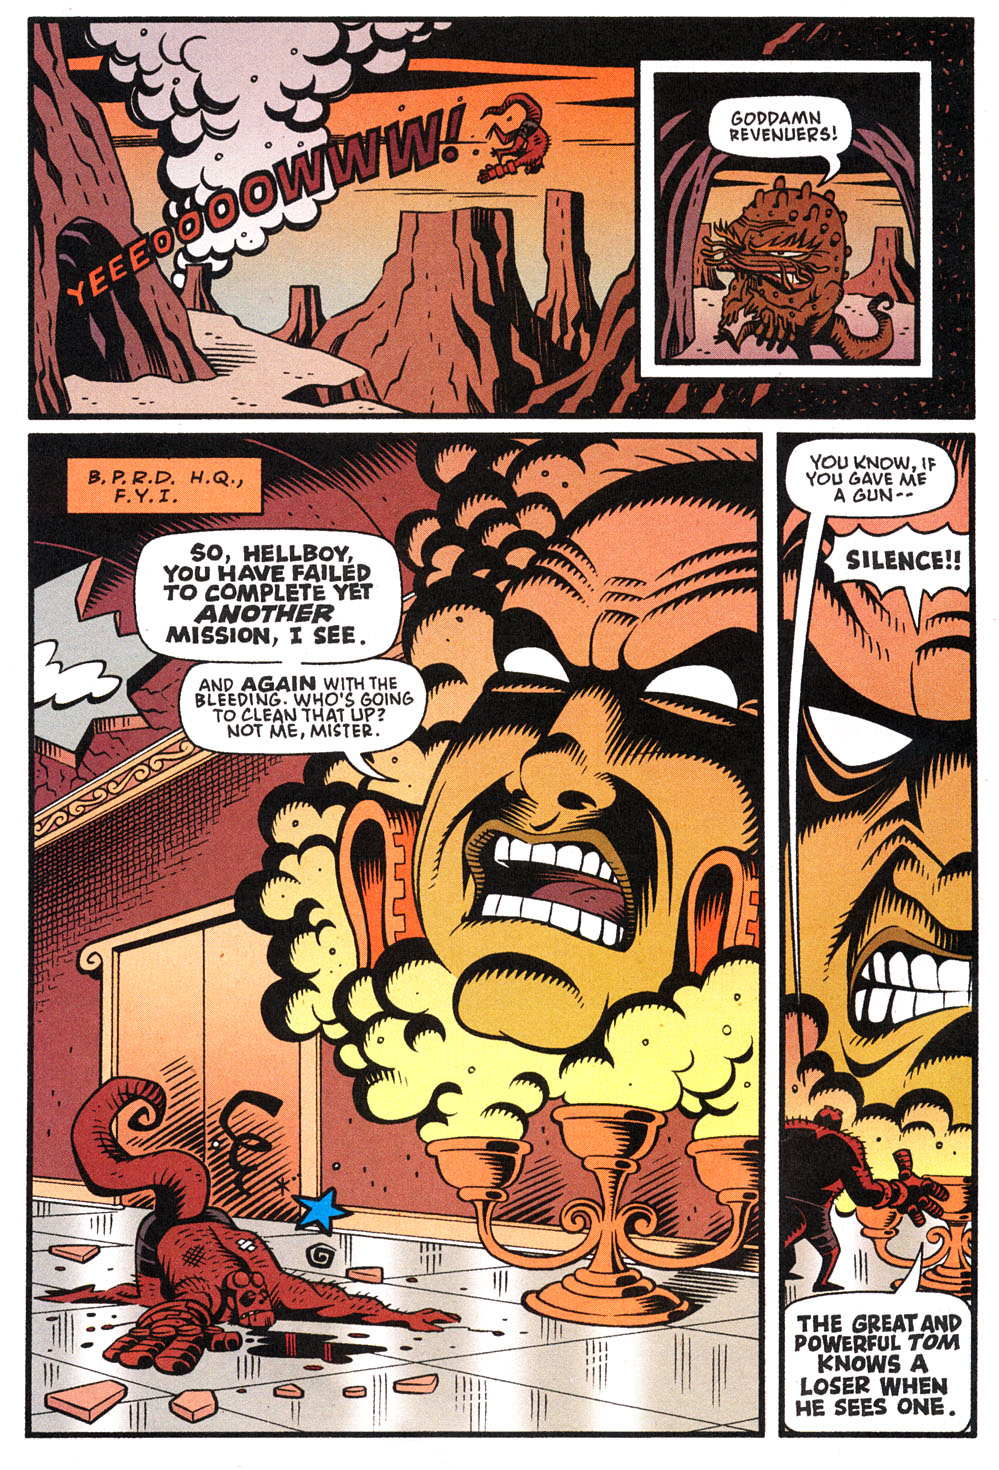 Read online Hellboy: Weird Tales comic -  Issue #4 - 16